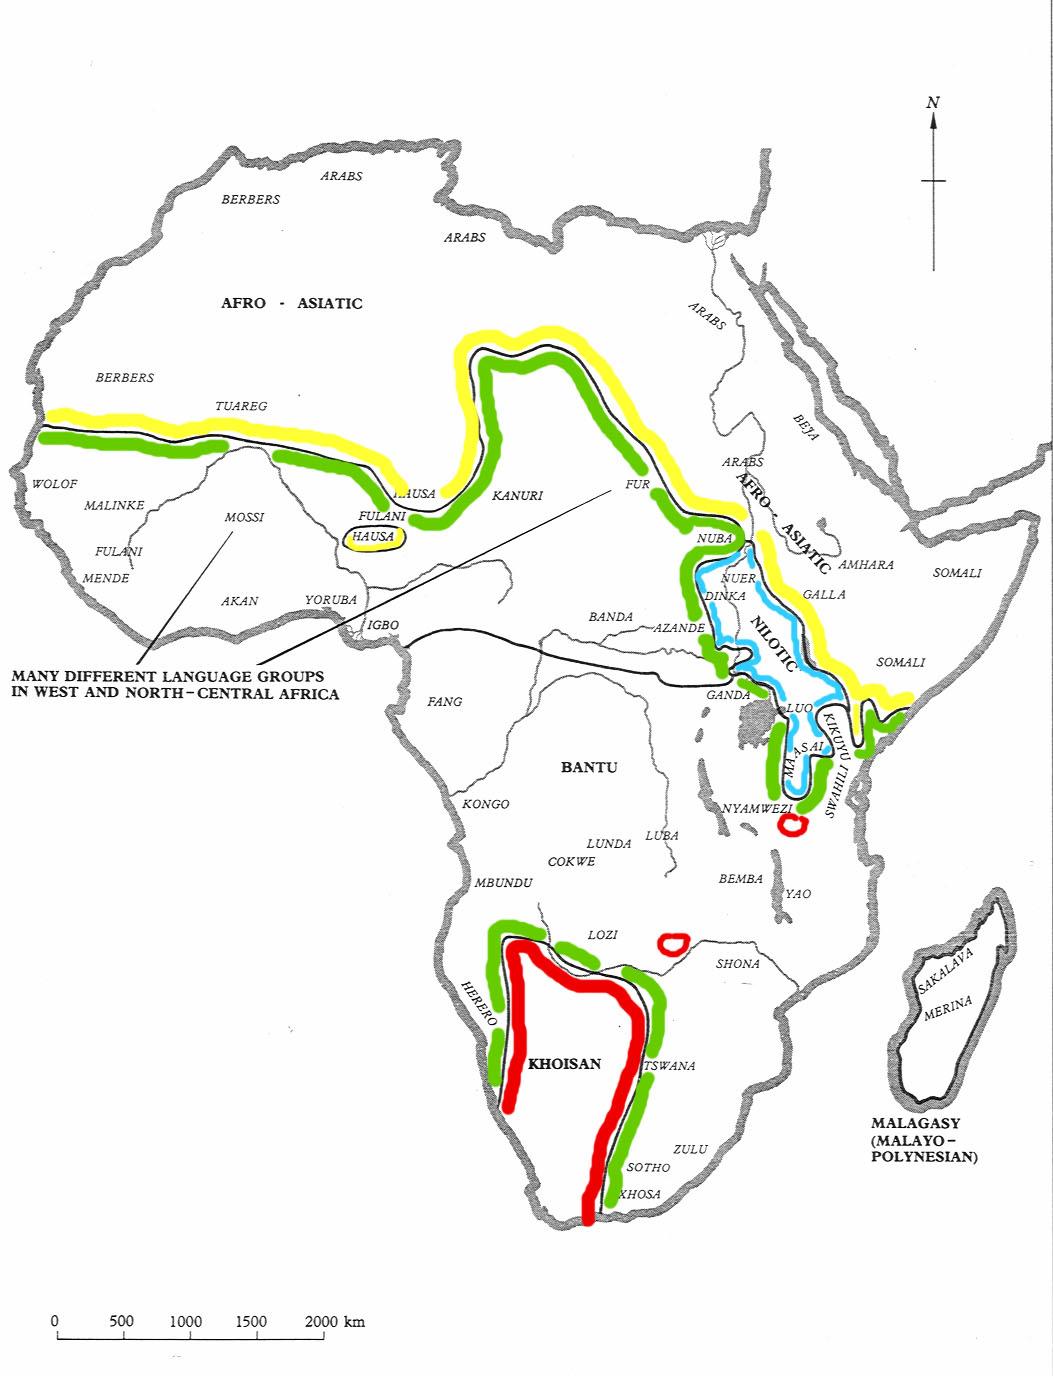 Cameroon Mbouda - Cameroon language map